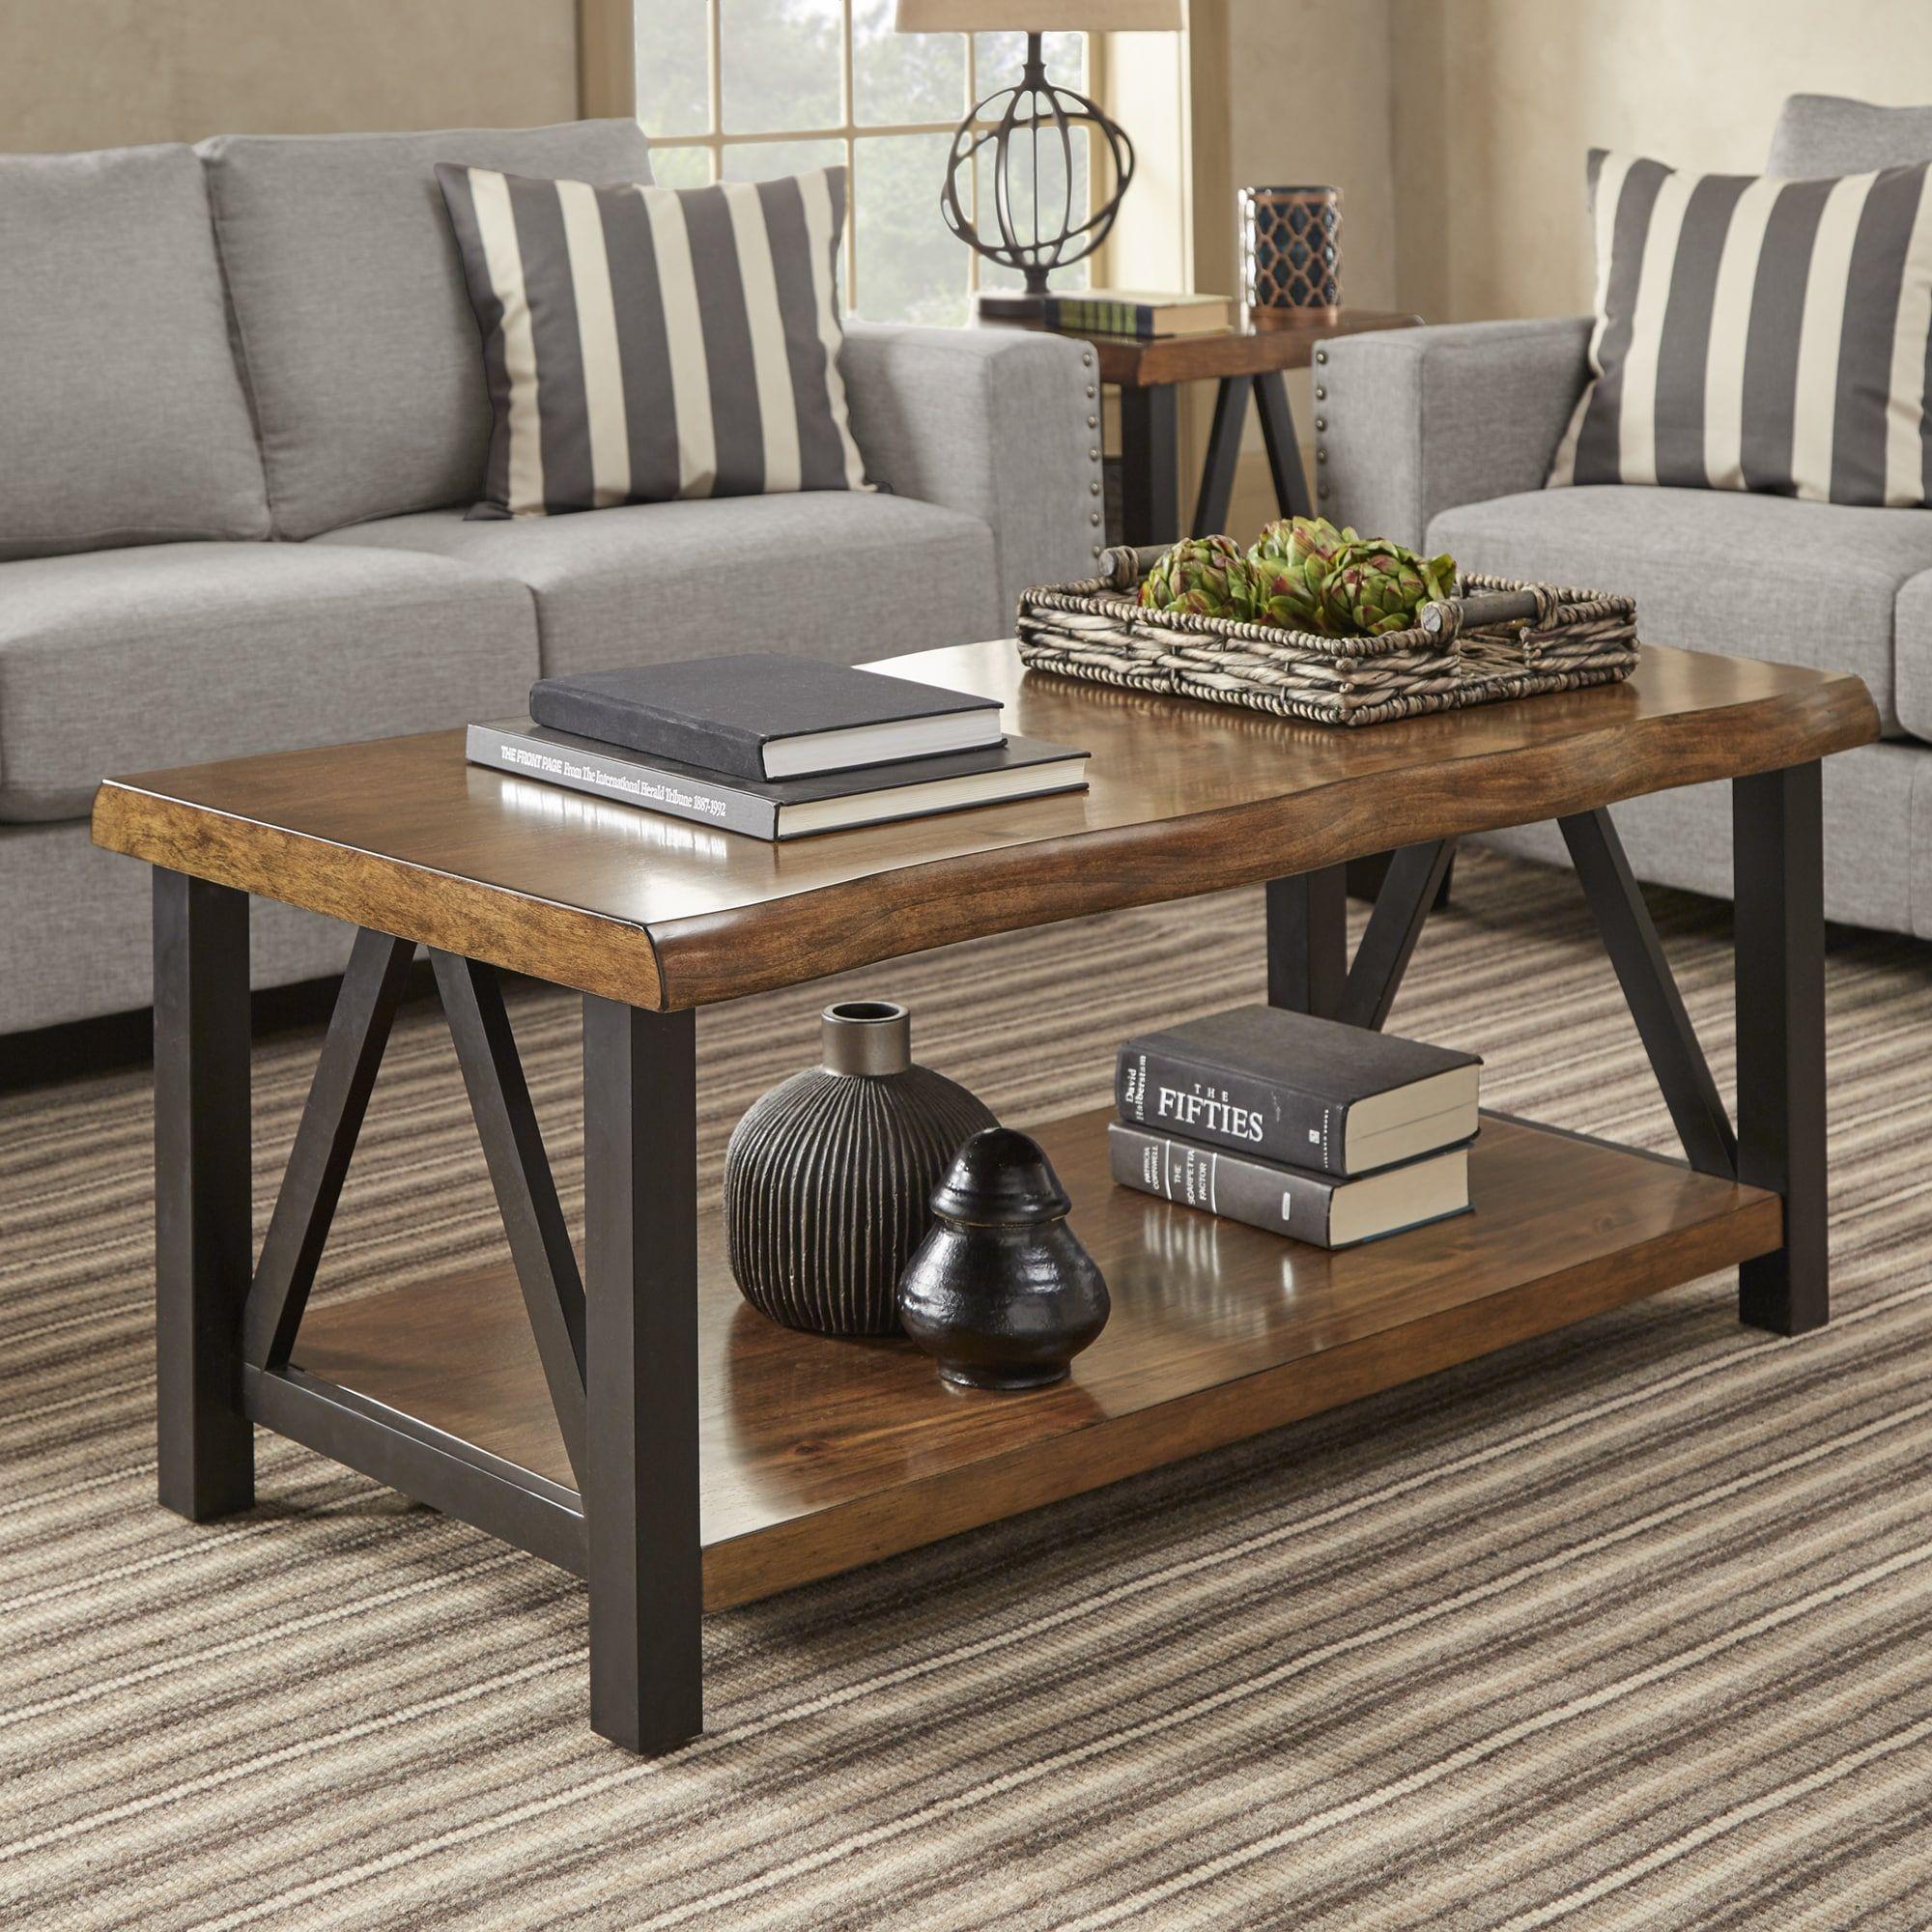 25+ Wood and metal coffee table room essentialstm ideas